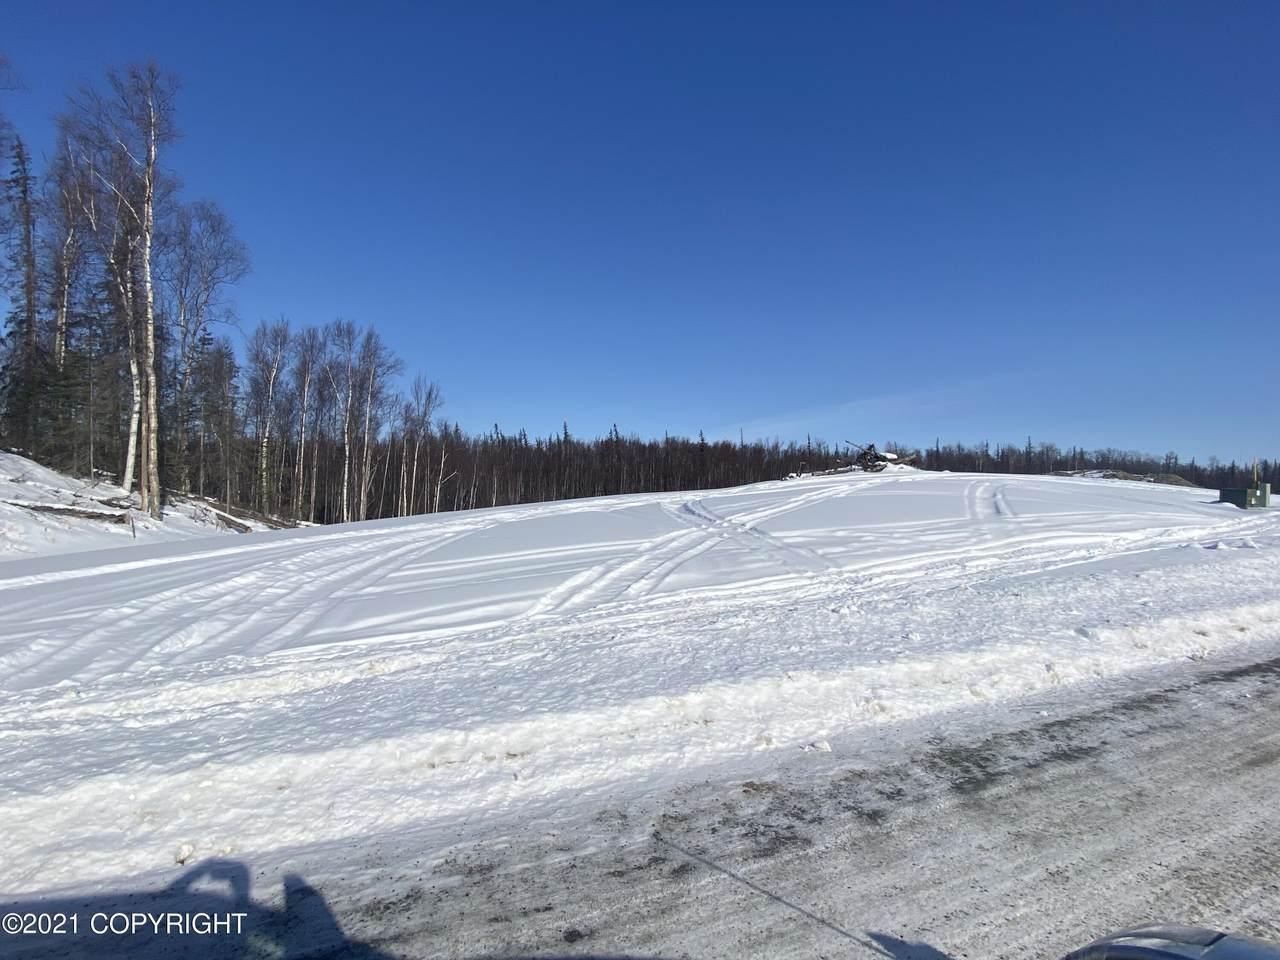 https://bt-photos.global.ssl.fastly.net/alaska/1280_boomver_3_21-4015-2.jpg